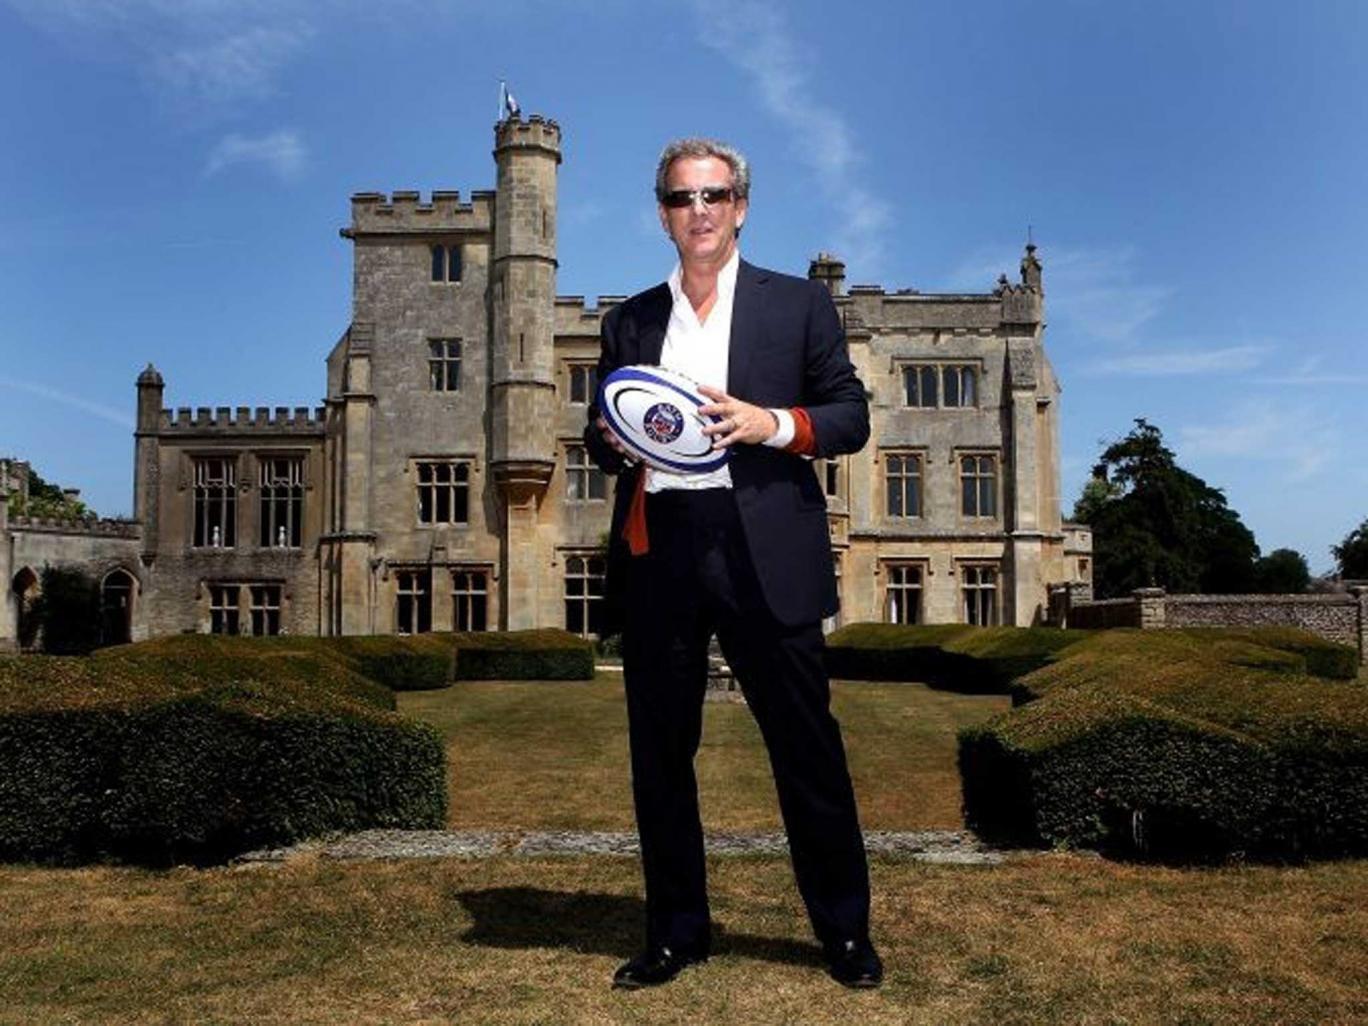 Tough talker: Bath's Bruce Craig